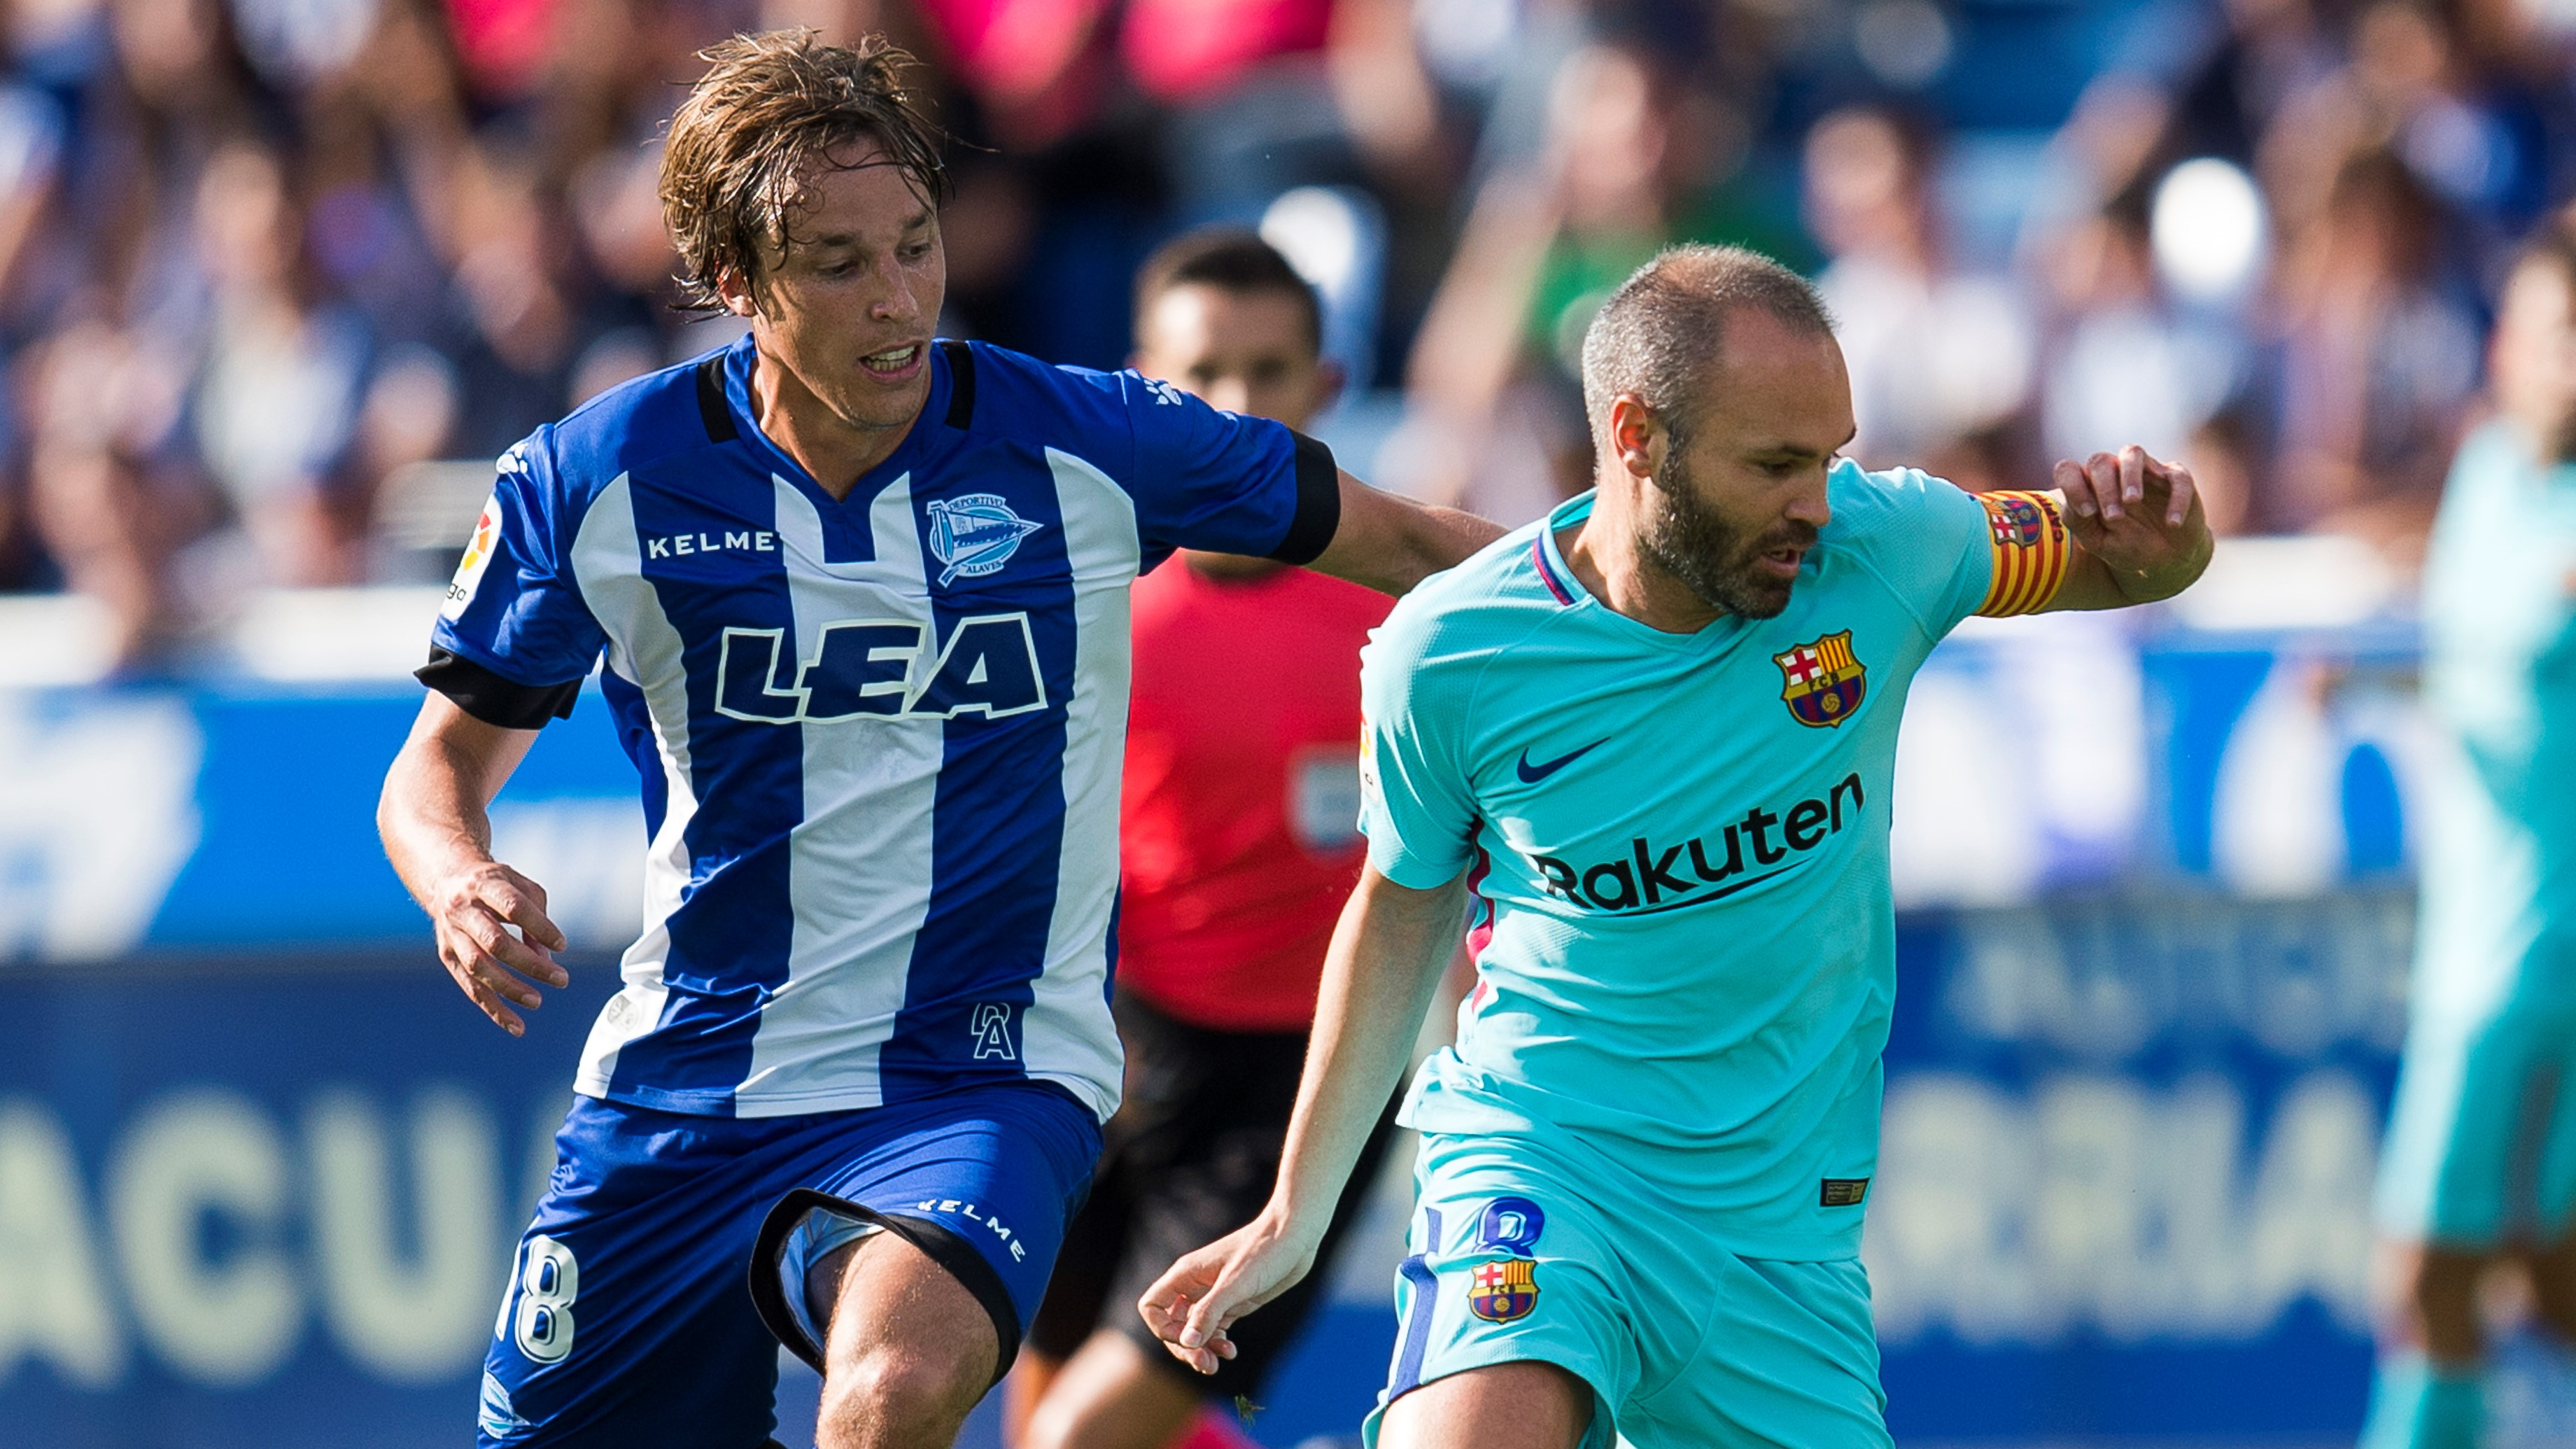 Andres Iniesta Tomas Pina Alavés Barcelona LaLiga 26082017